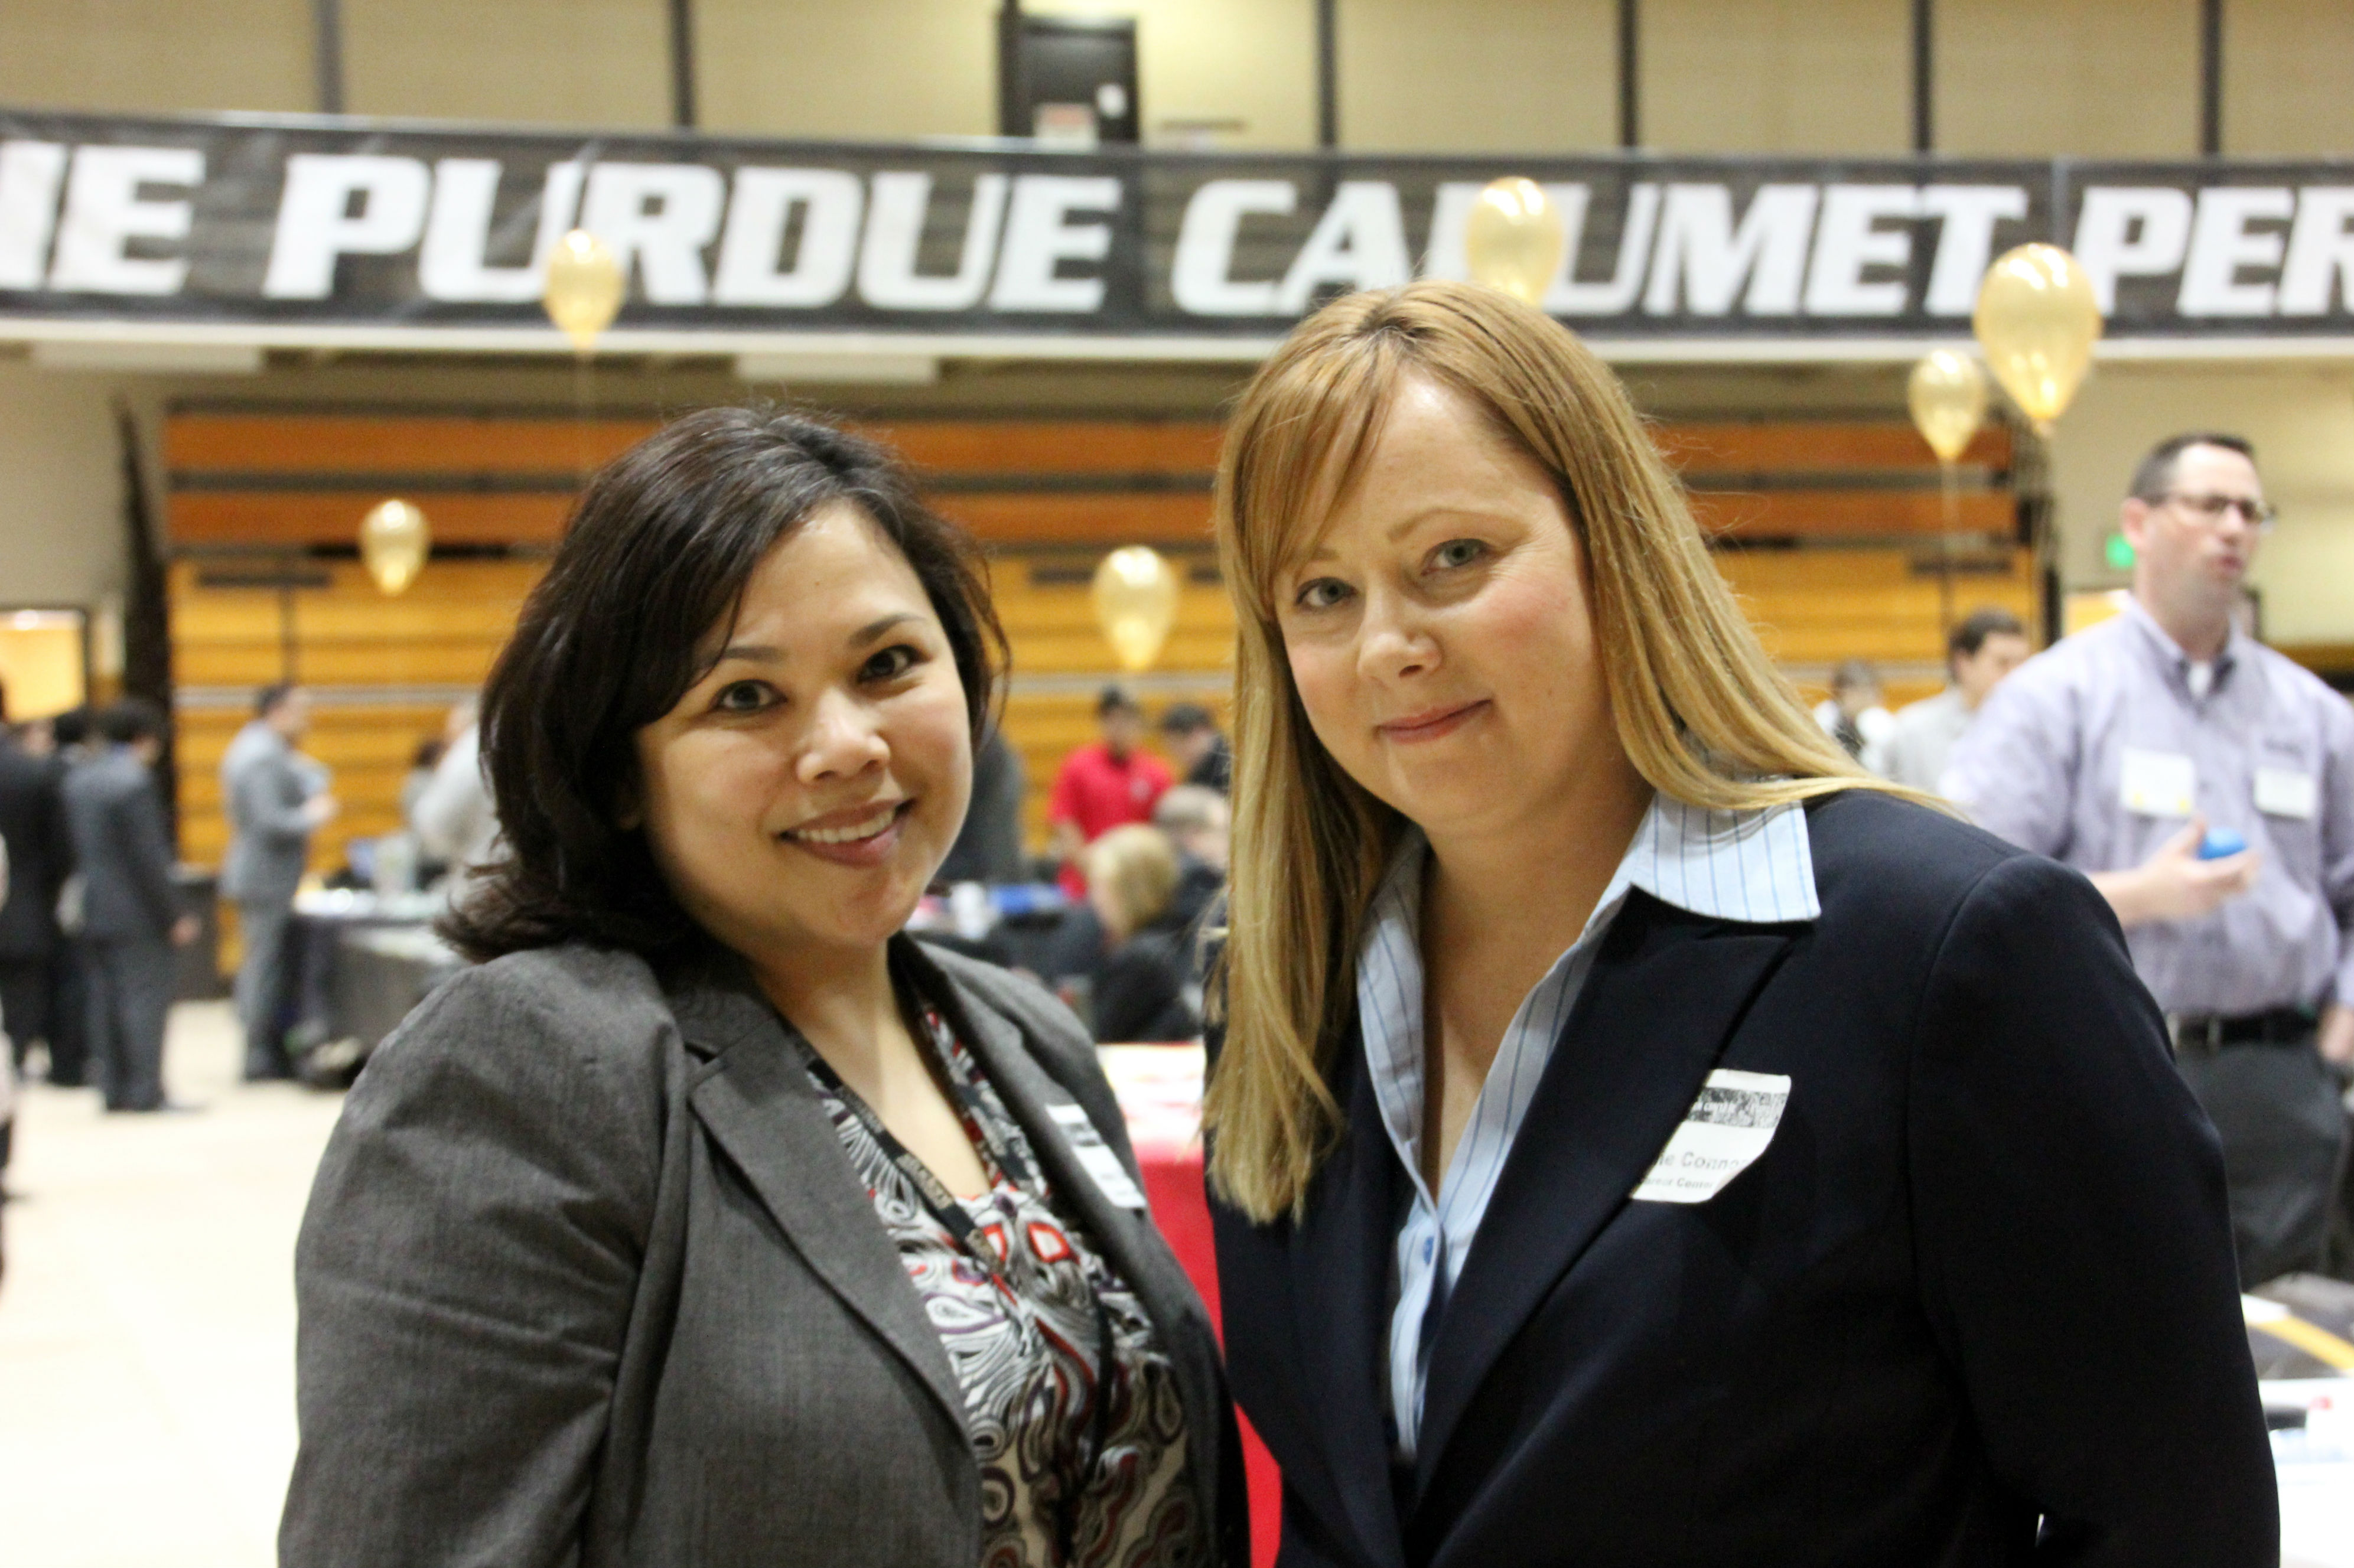 Purdue University Calumet Career Fair Looks for Talented Students